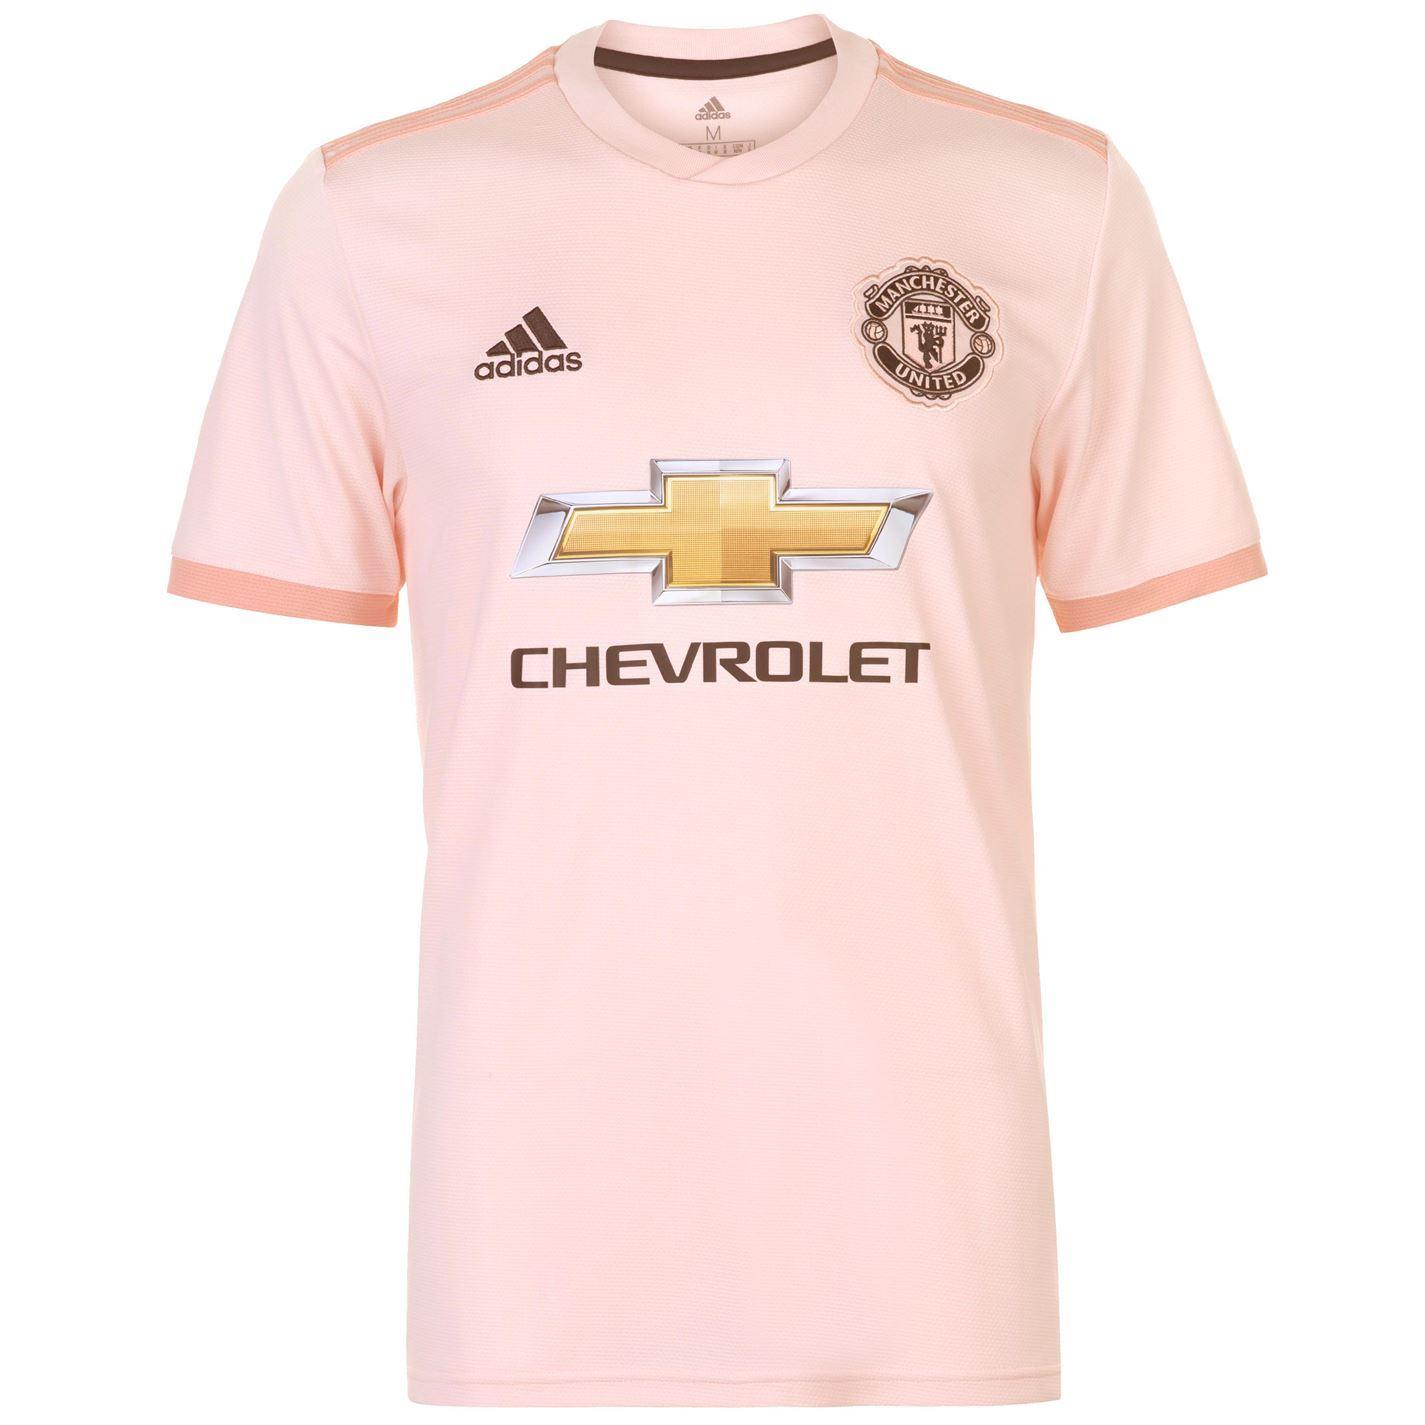 6c79e14acb213 ... adidas Manchester United Away Jersey 2018 19 Mens Pink Football Soccer  Shirt Top